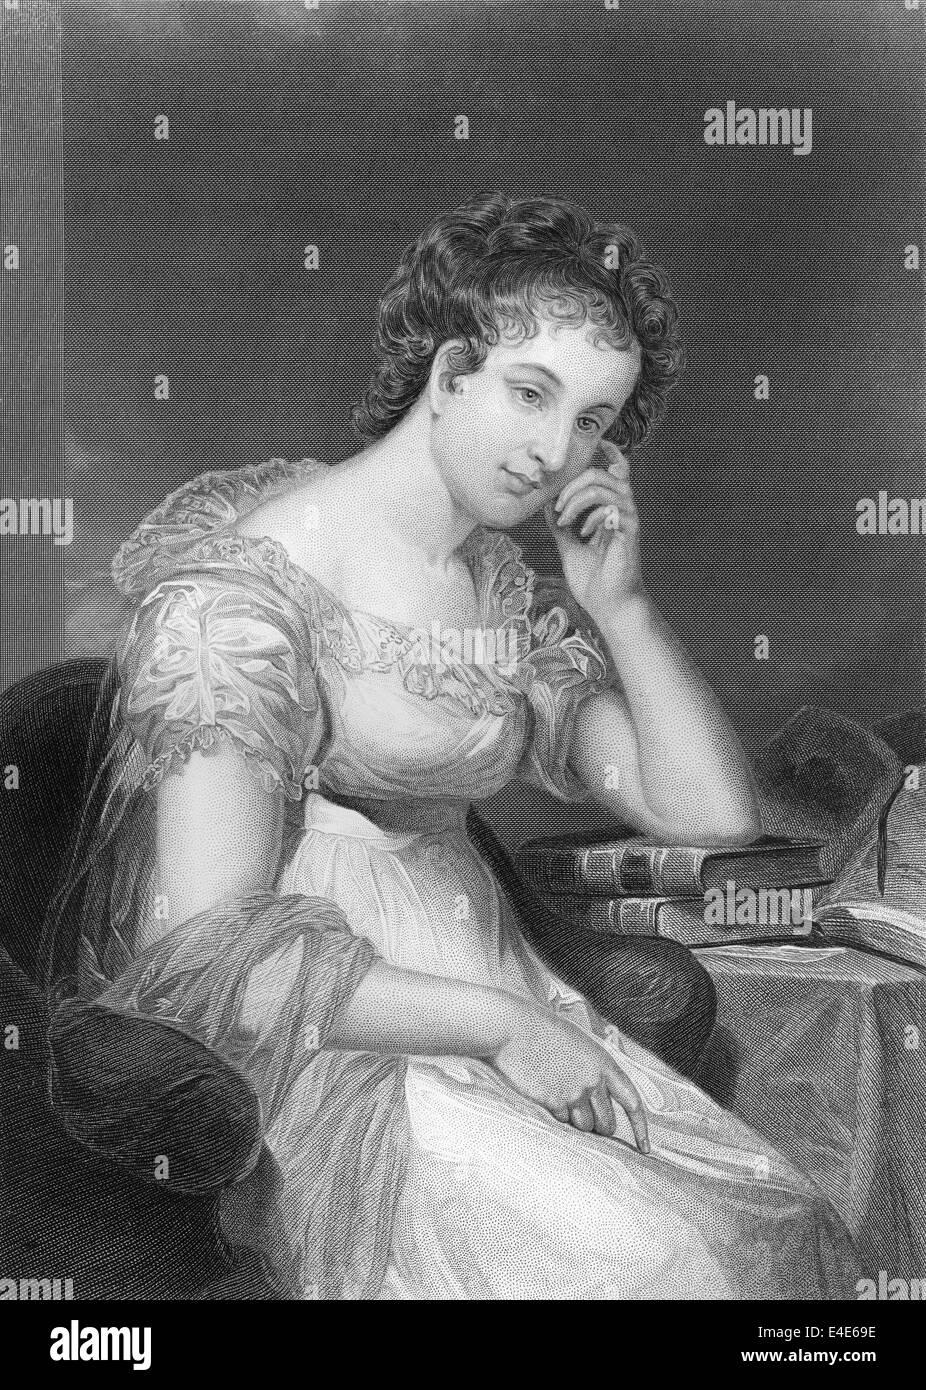 Maria Edgeworth, 1768 - 1849, an Anglo-Irish writer, - Stock Image